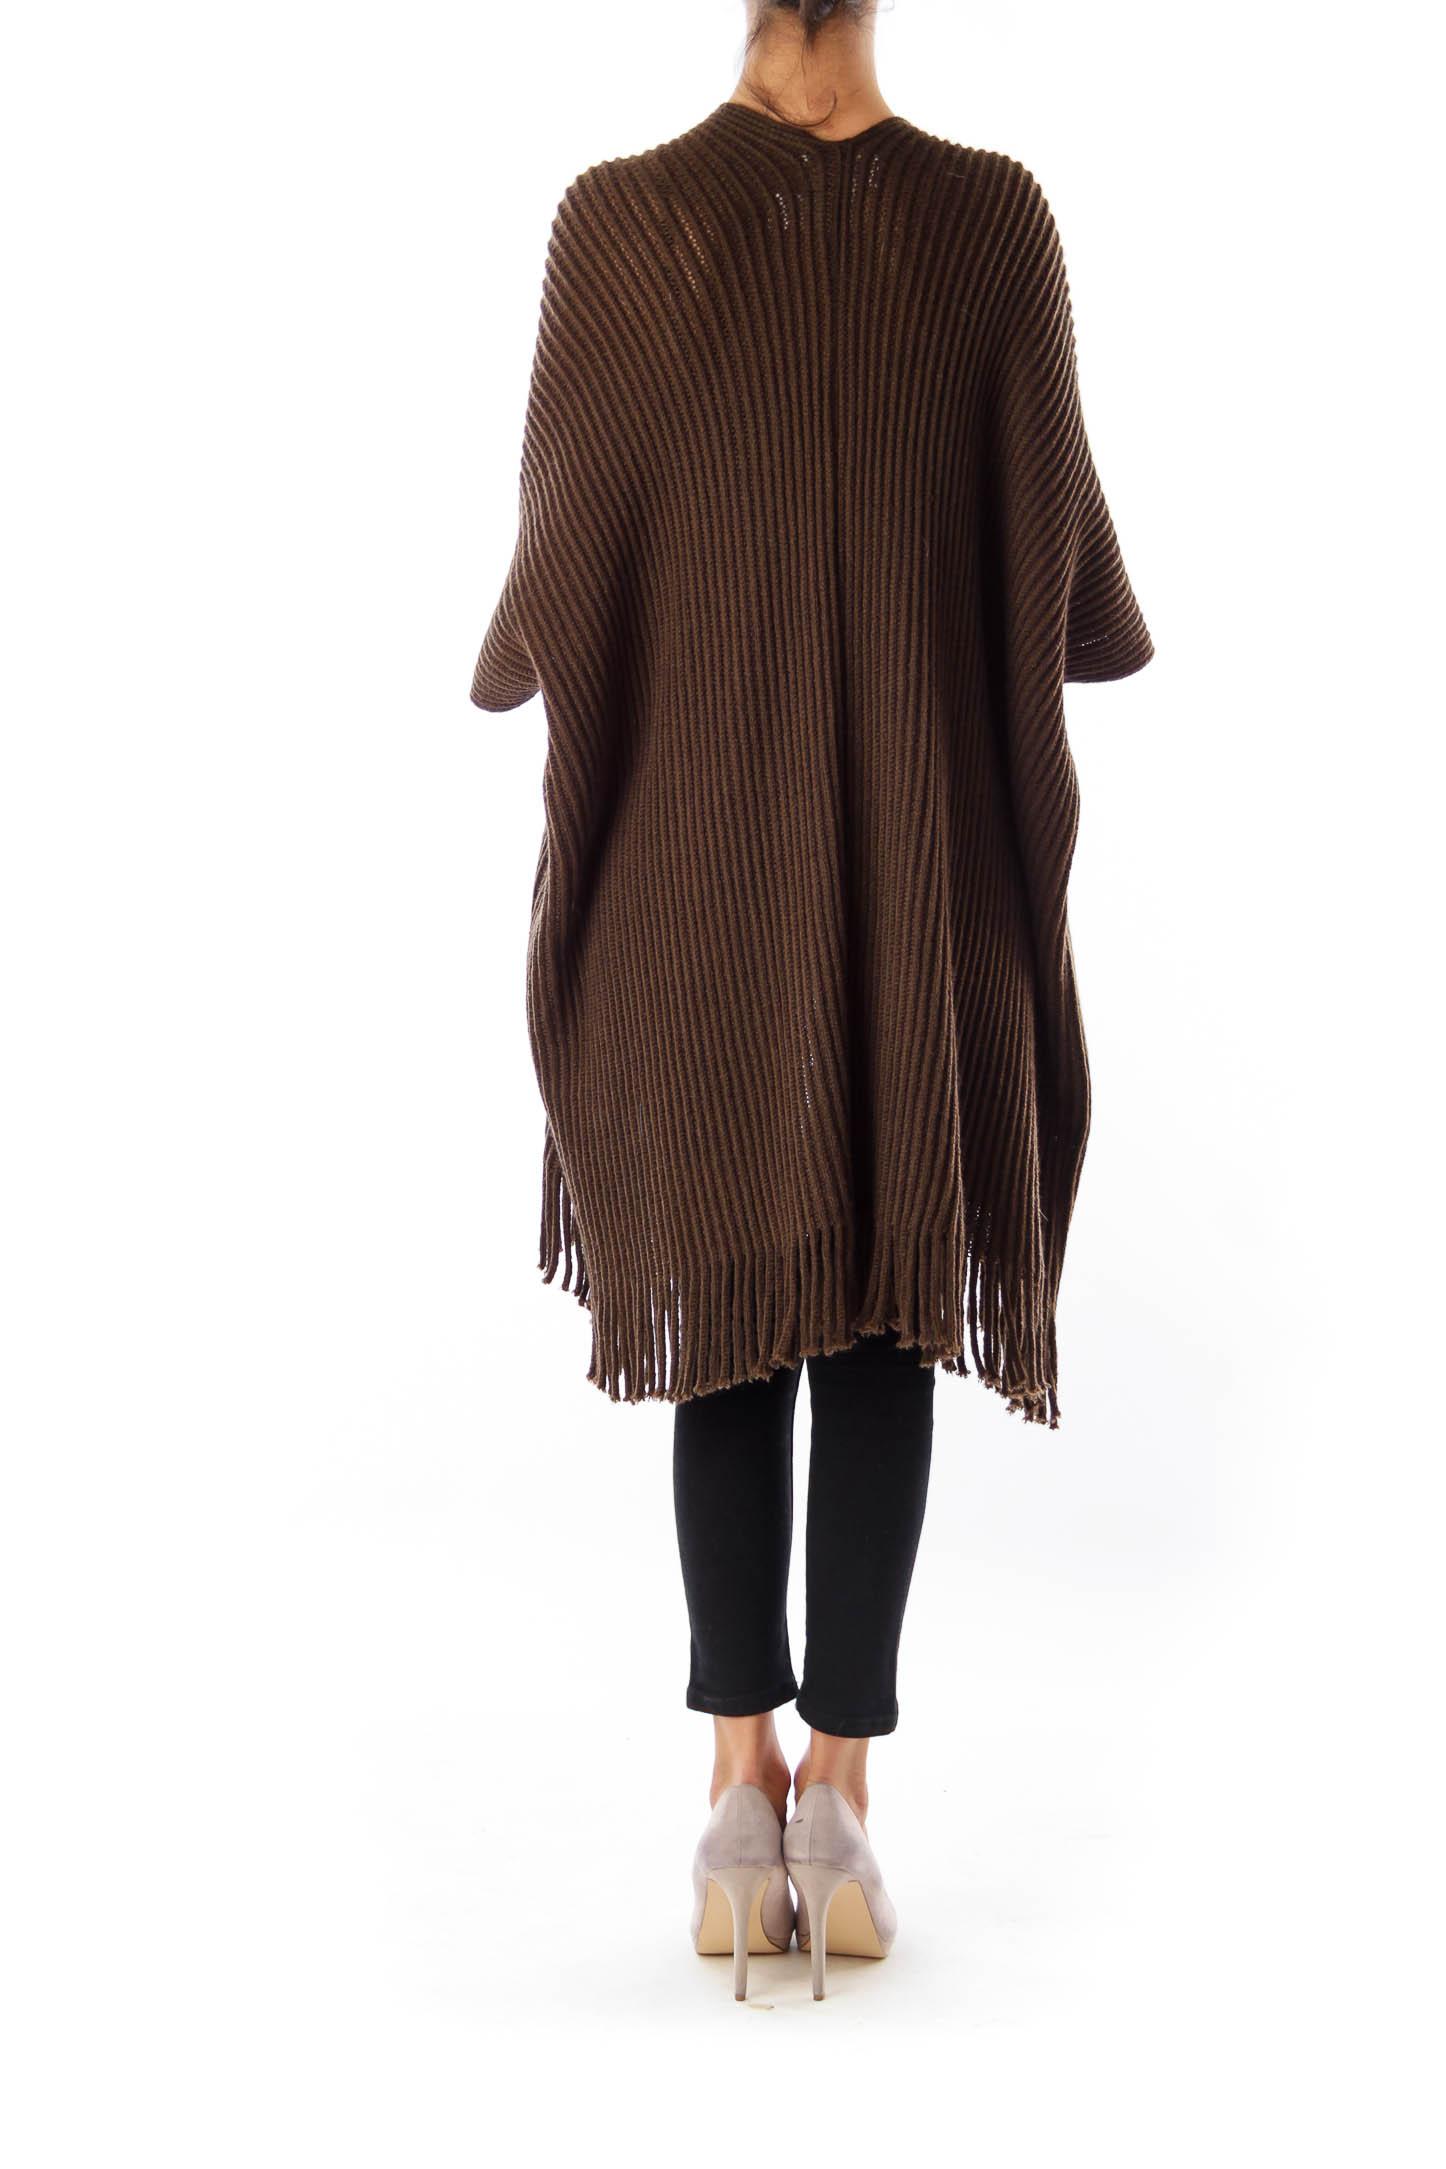 Brown Fringe Short Sleeve Cardigan [None] - SilkRoll